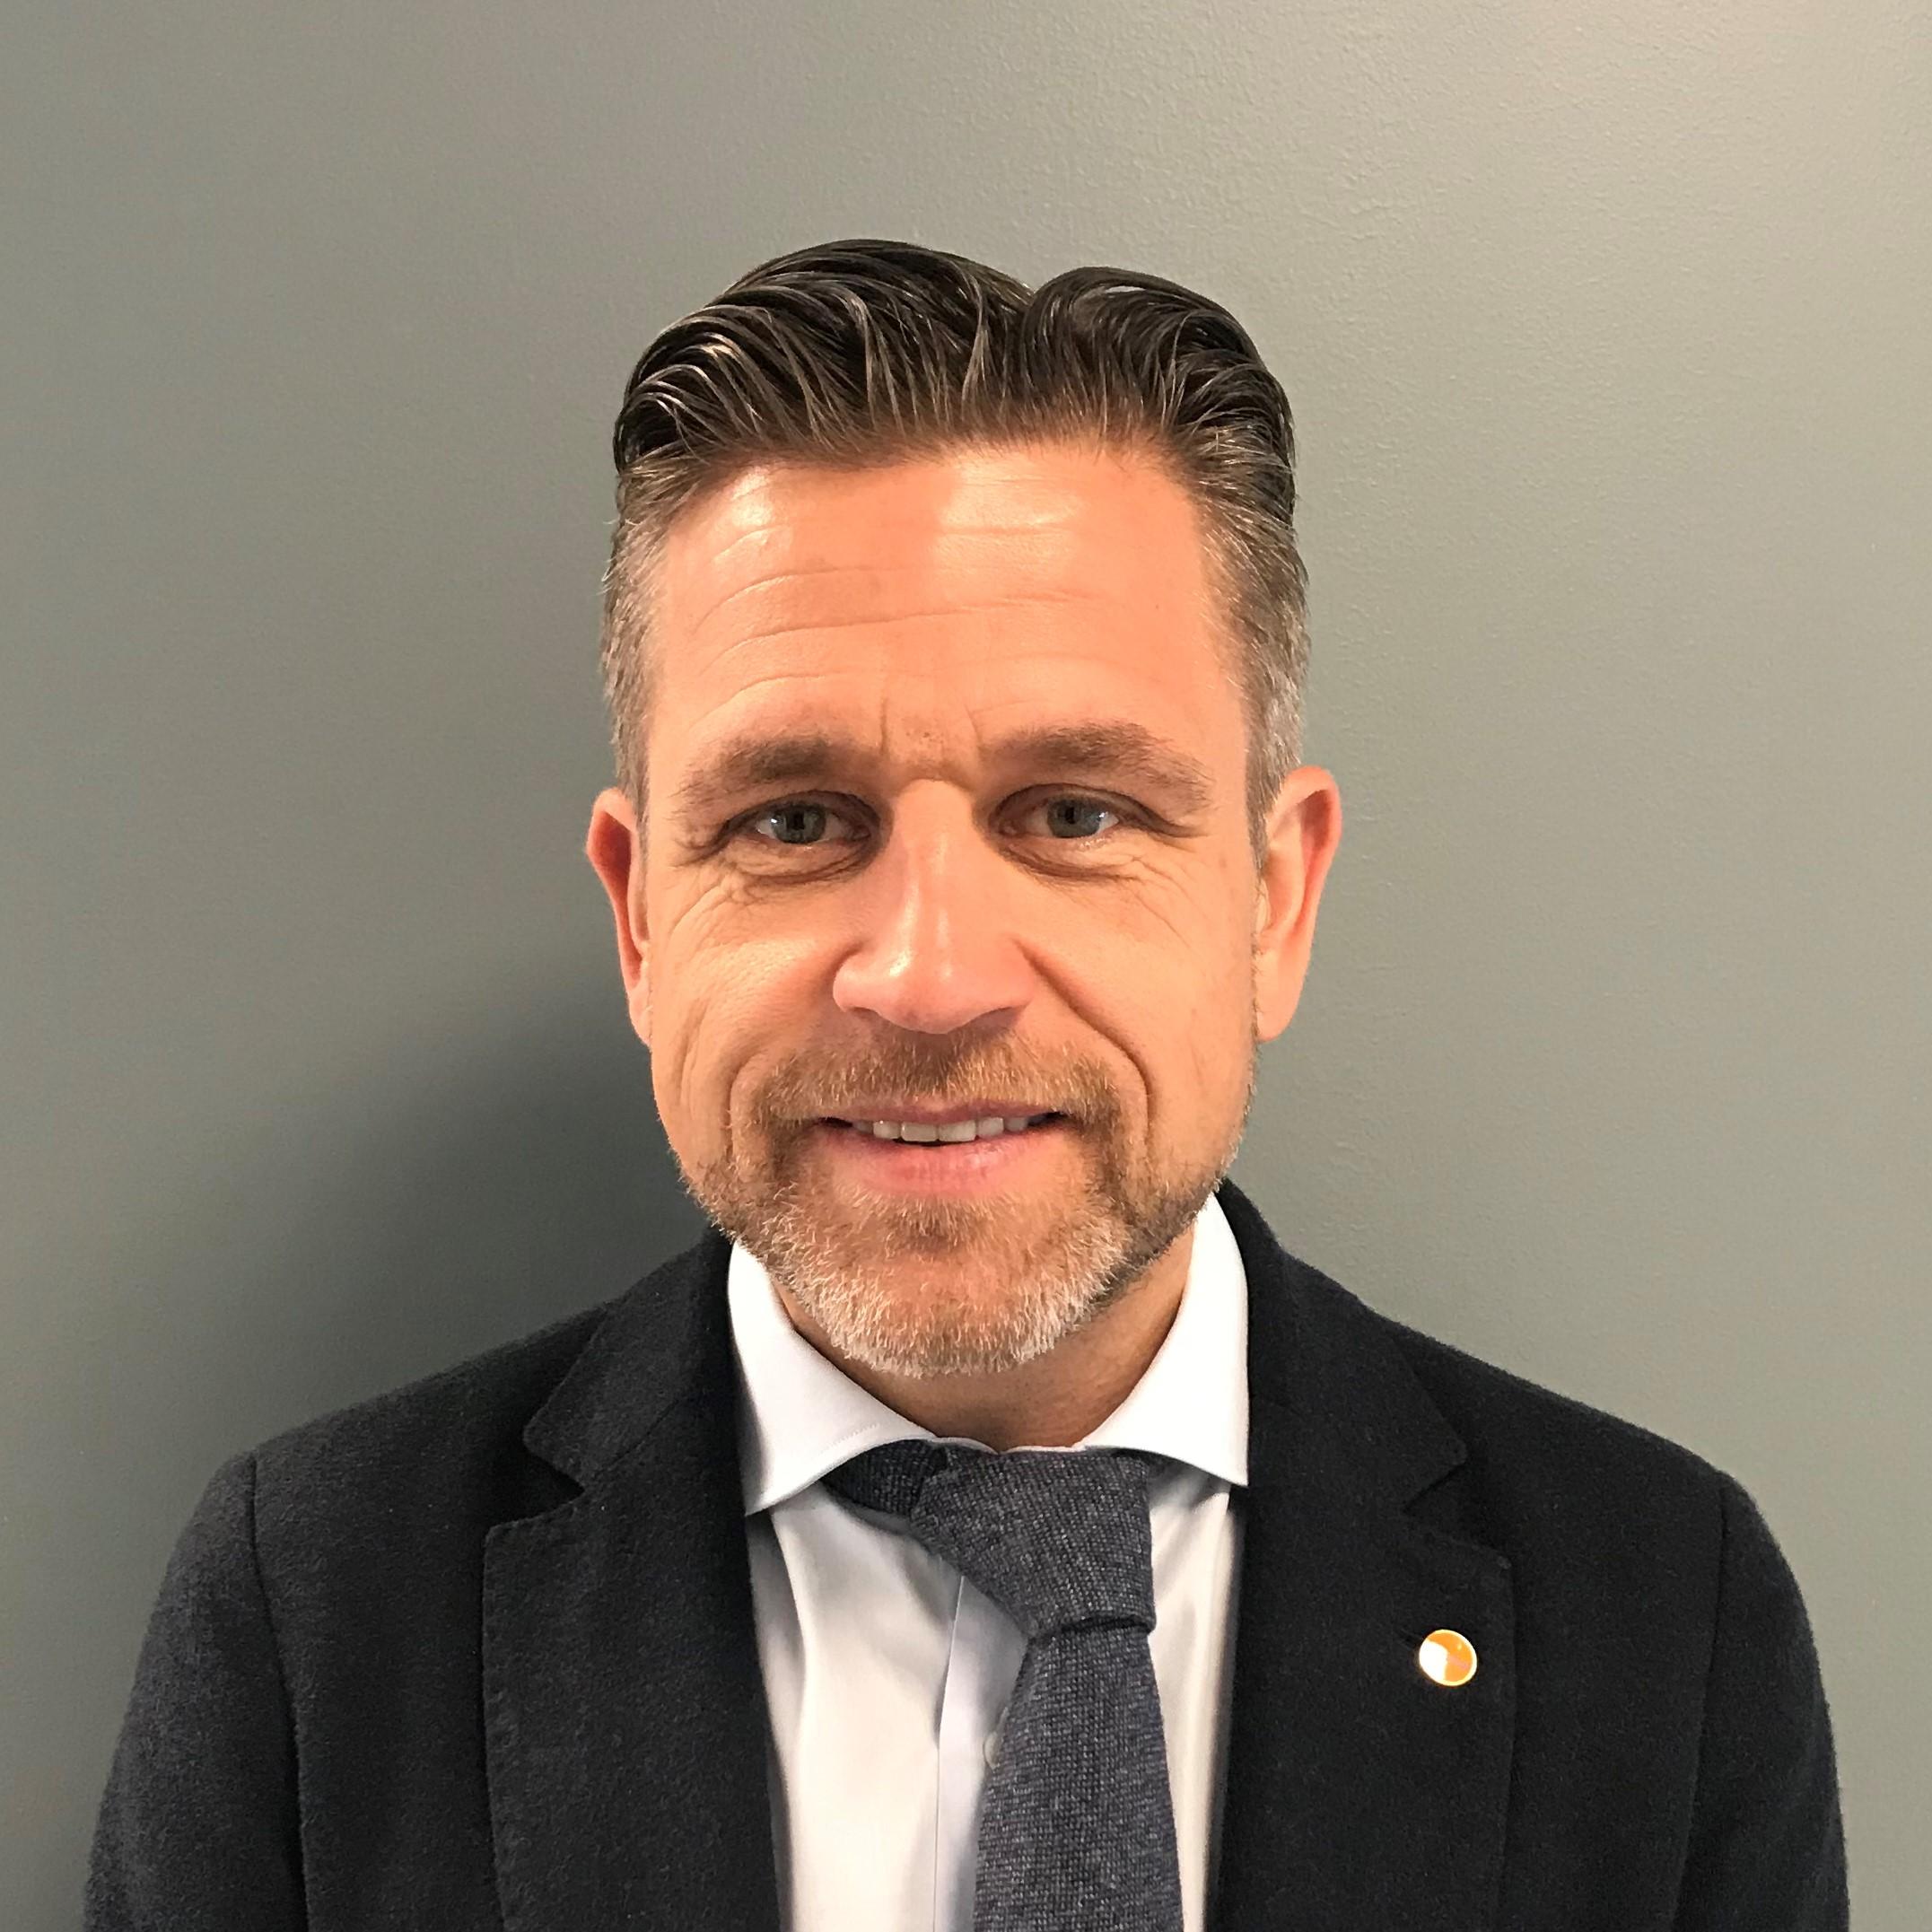 Svante Paulsson